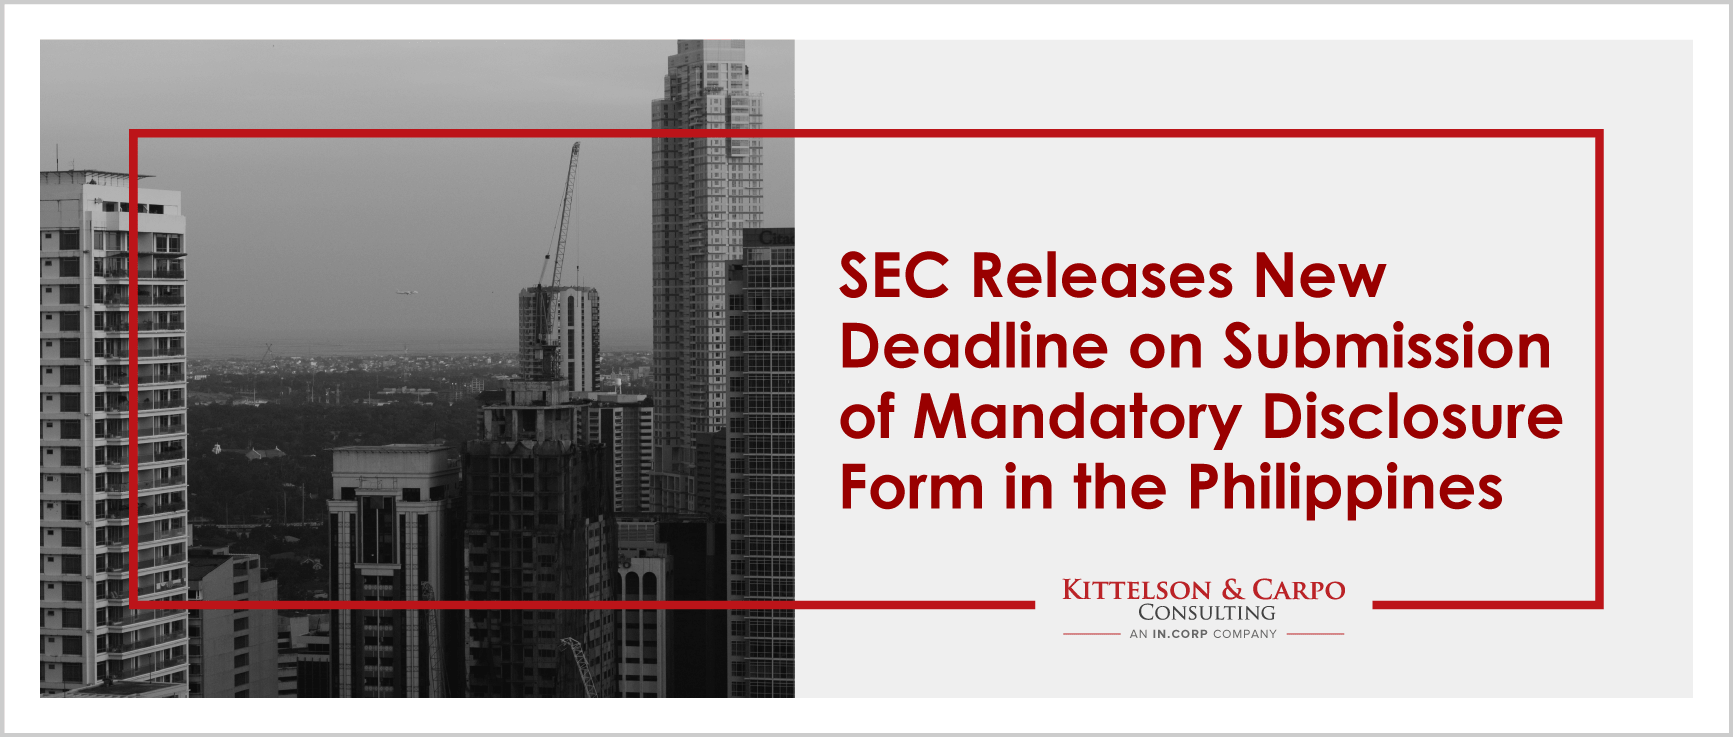 SEC Mandatory Disclosure Form Deadline